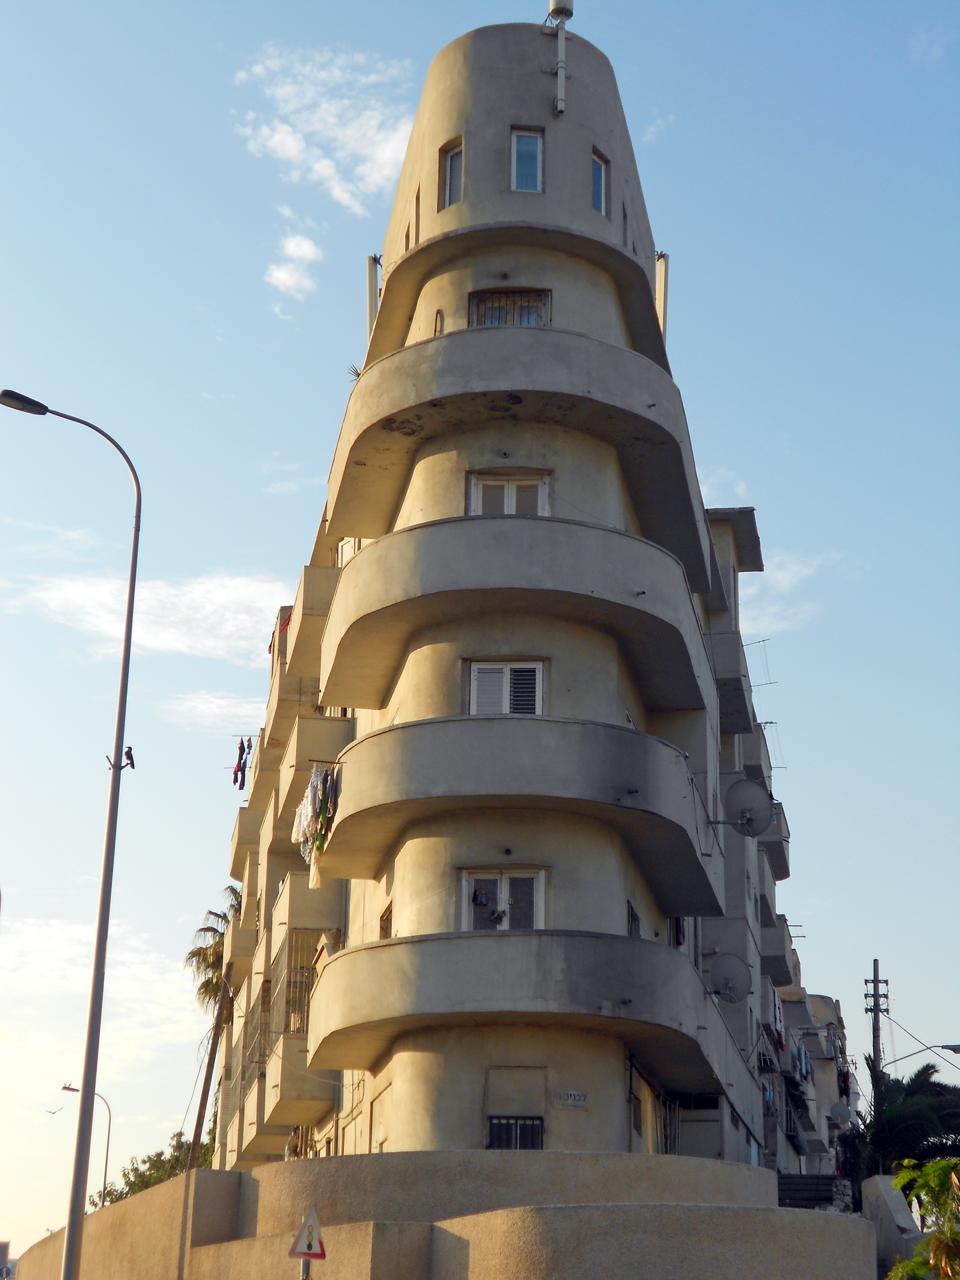 Bauhaus architecture Tel Aviv